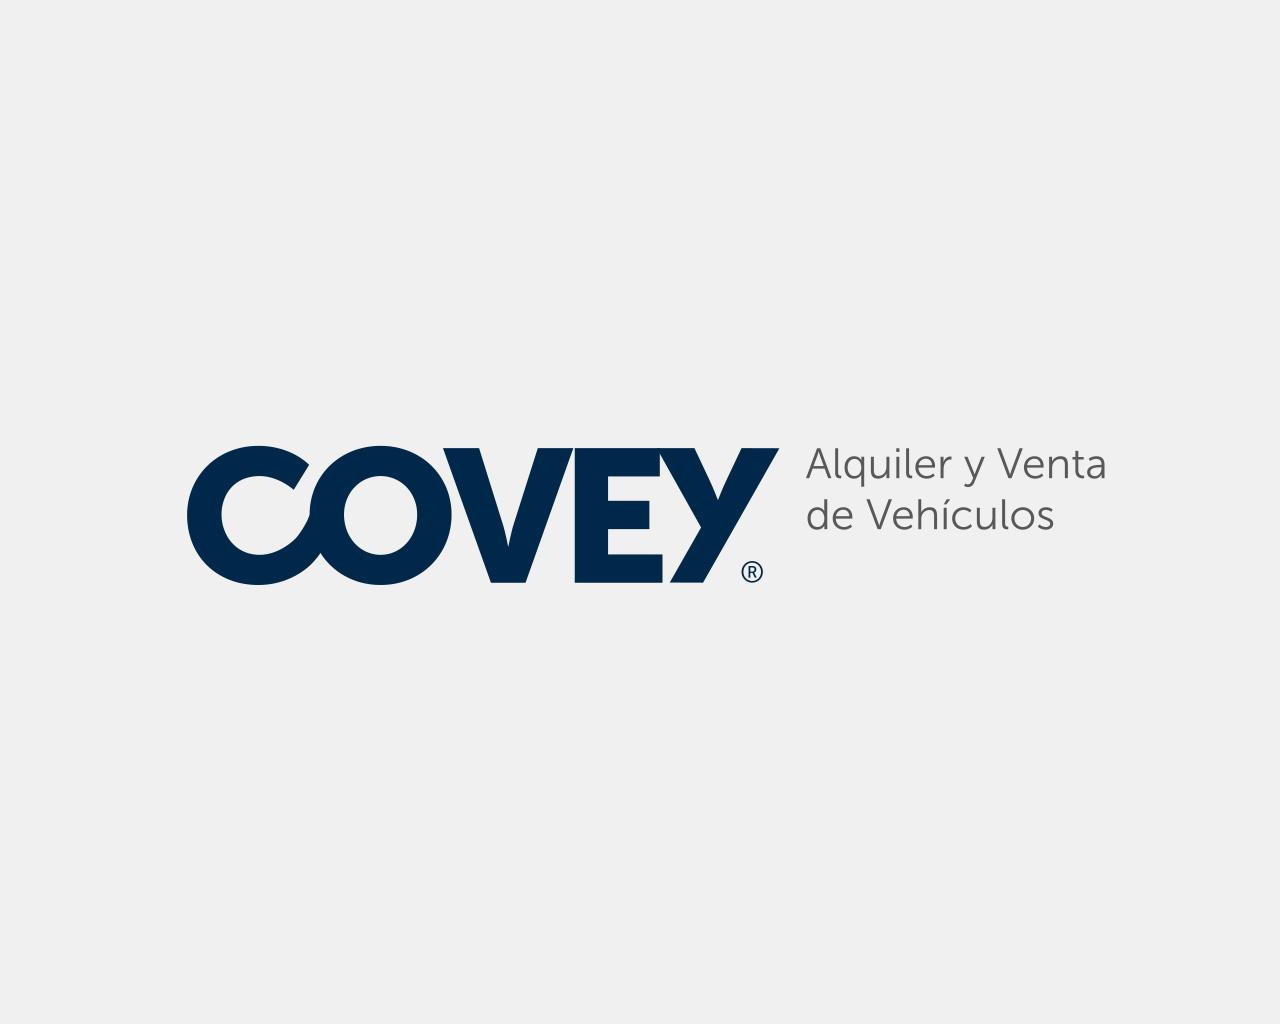 Logo Covey Alquiler de Vehículos, diseñado por Momo & Cía.